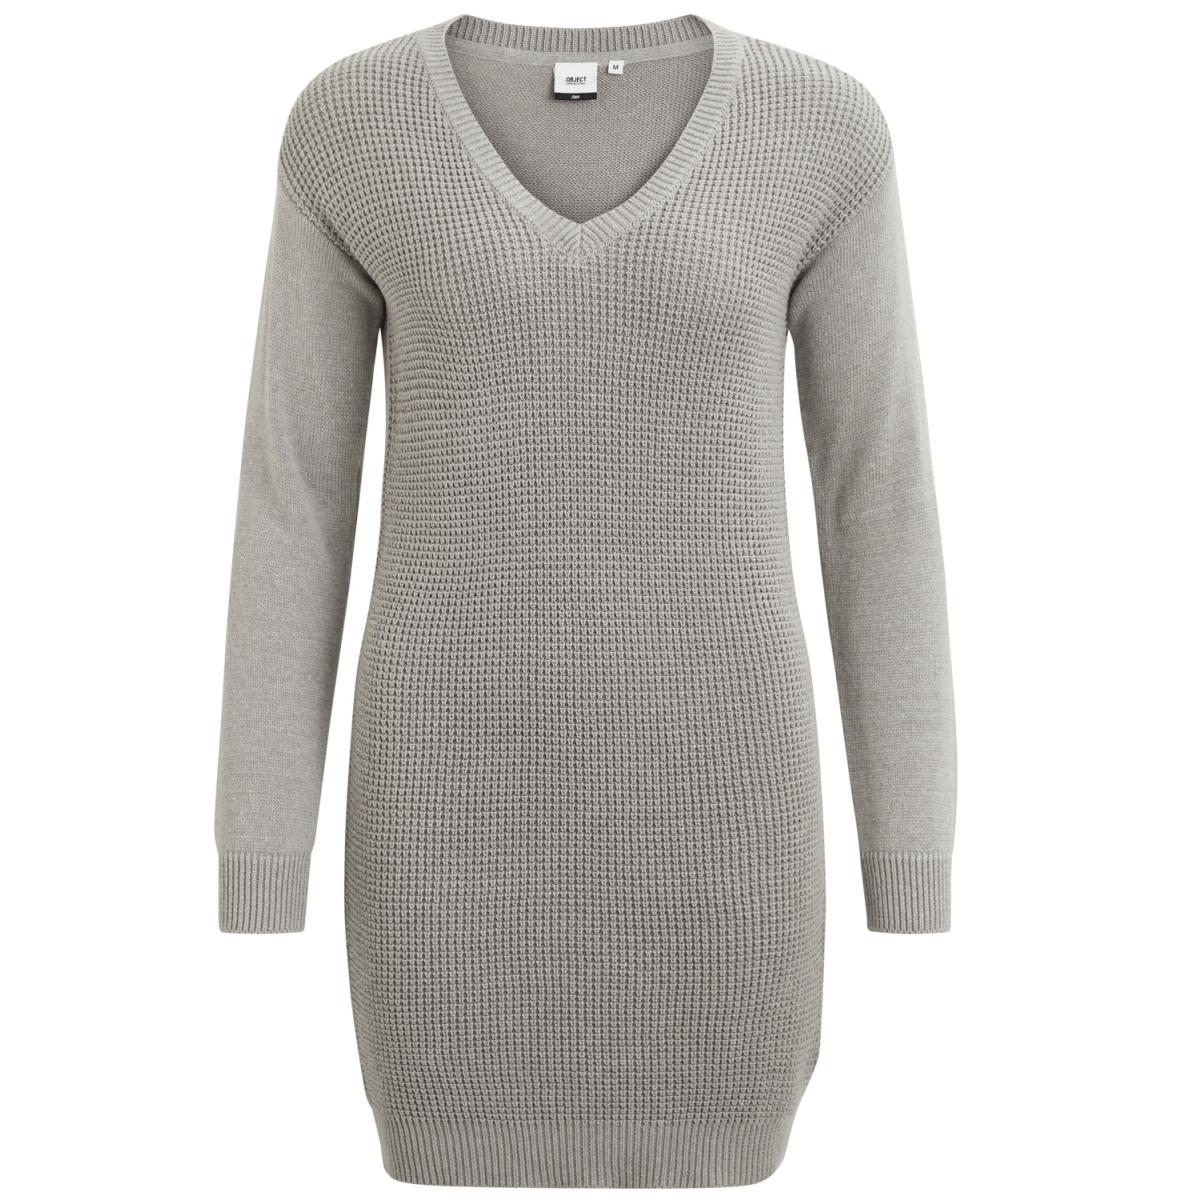 objdeah l/s knit dress 86 .i 23023274 object jurk light grey melange